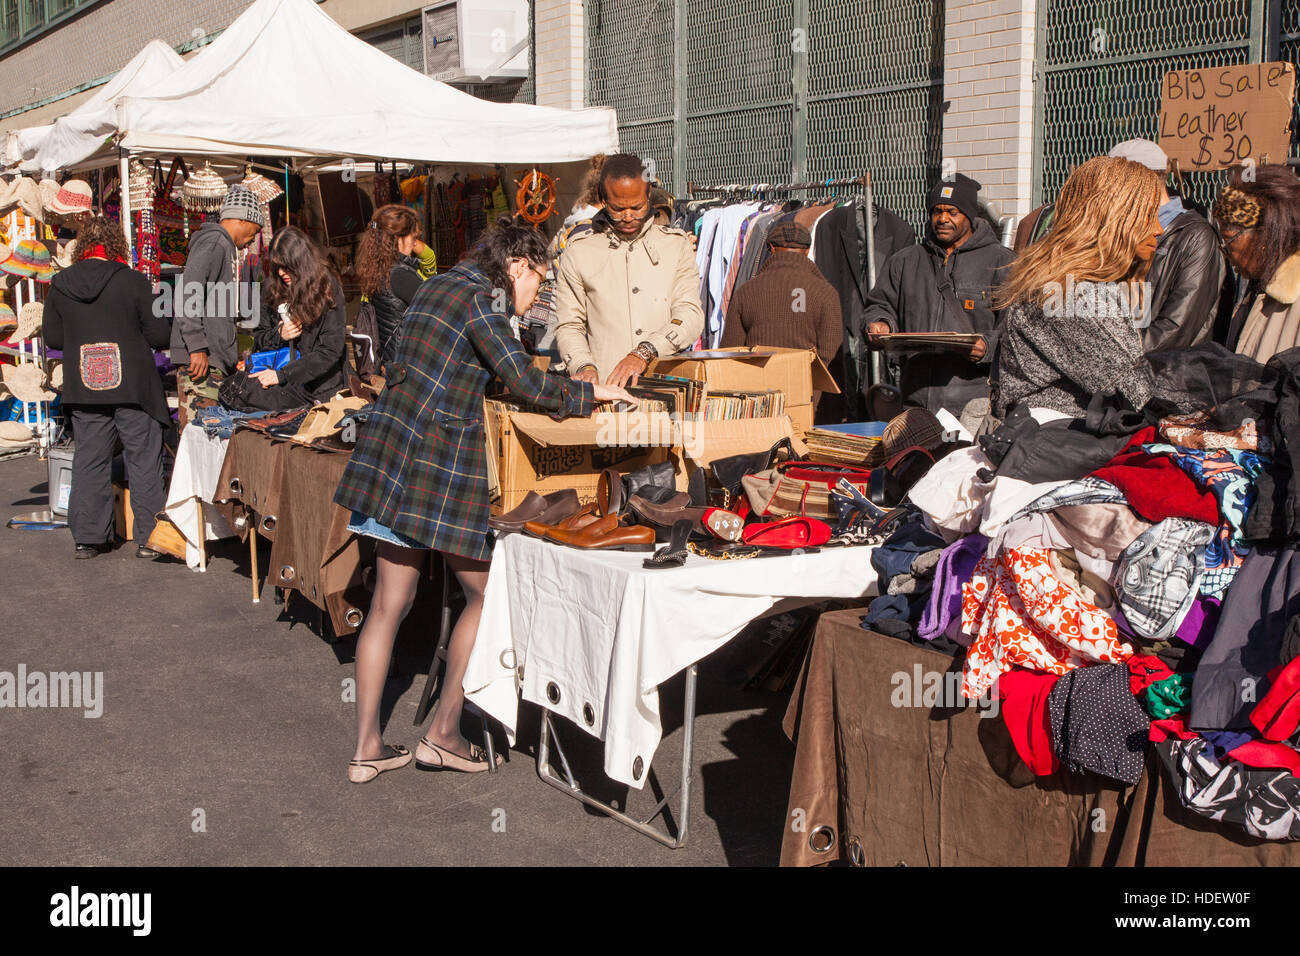 The Grand Bazaar Sunday market, Upper West Side of Manhattan